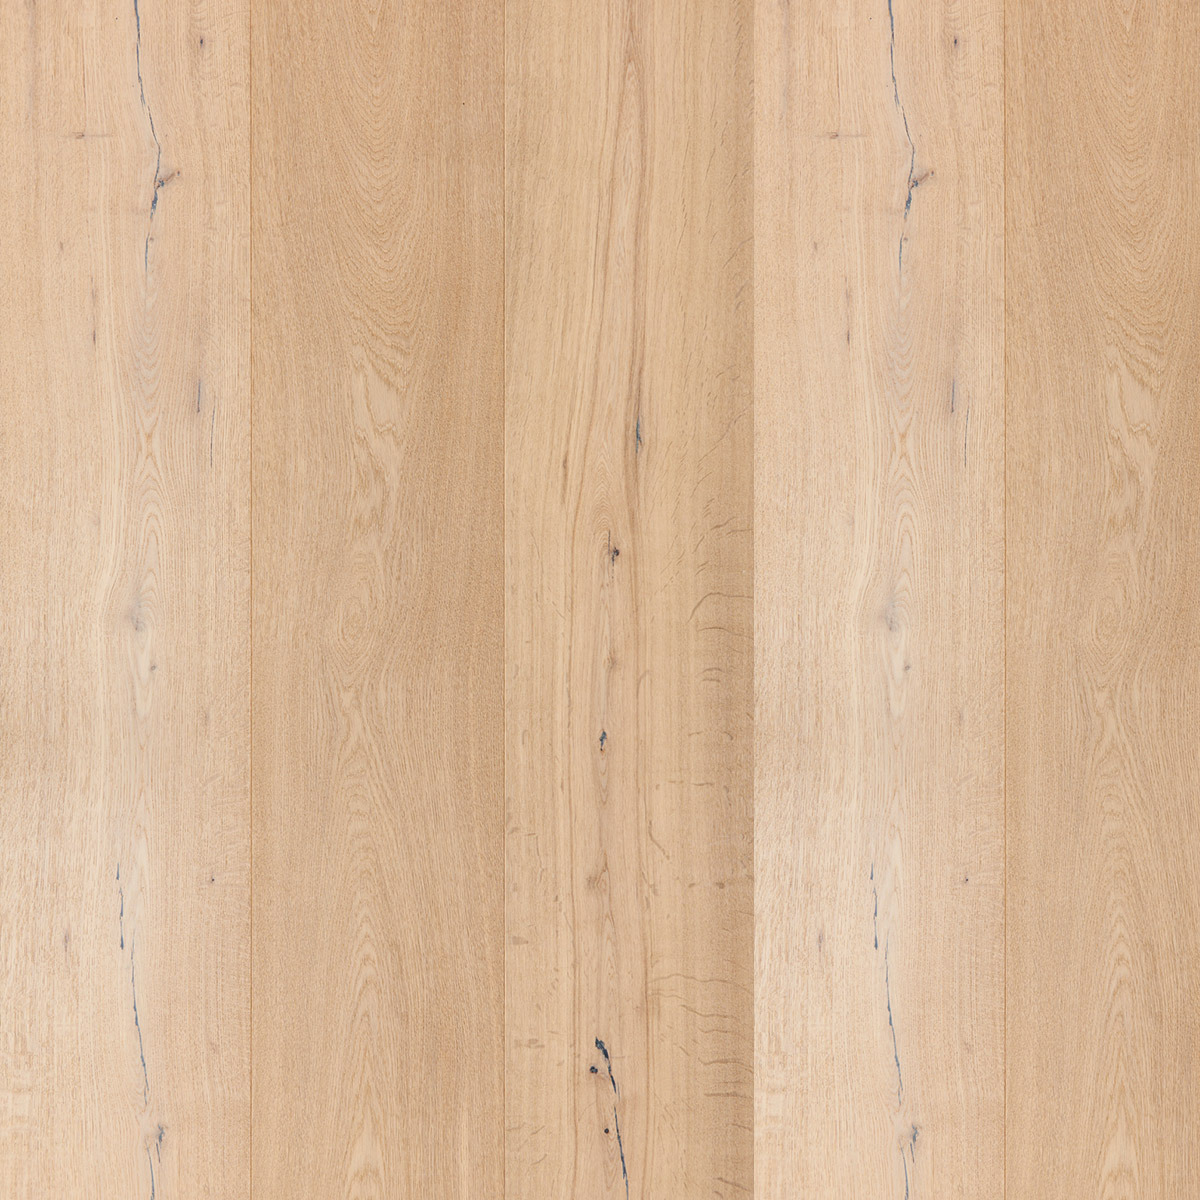 Habitat flooring